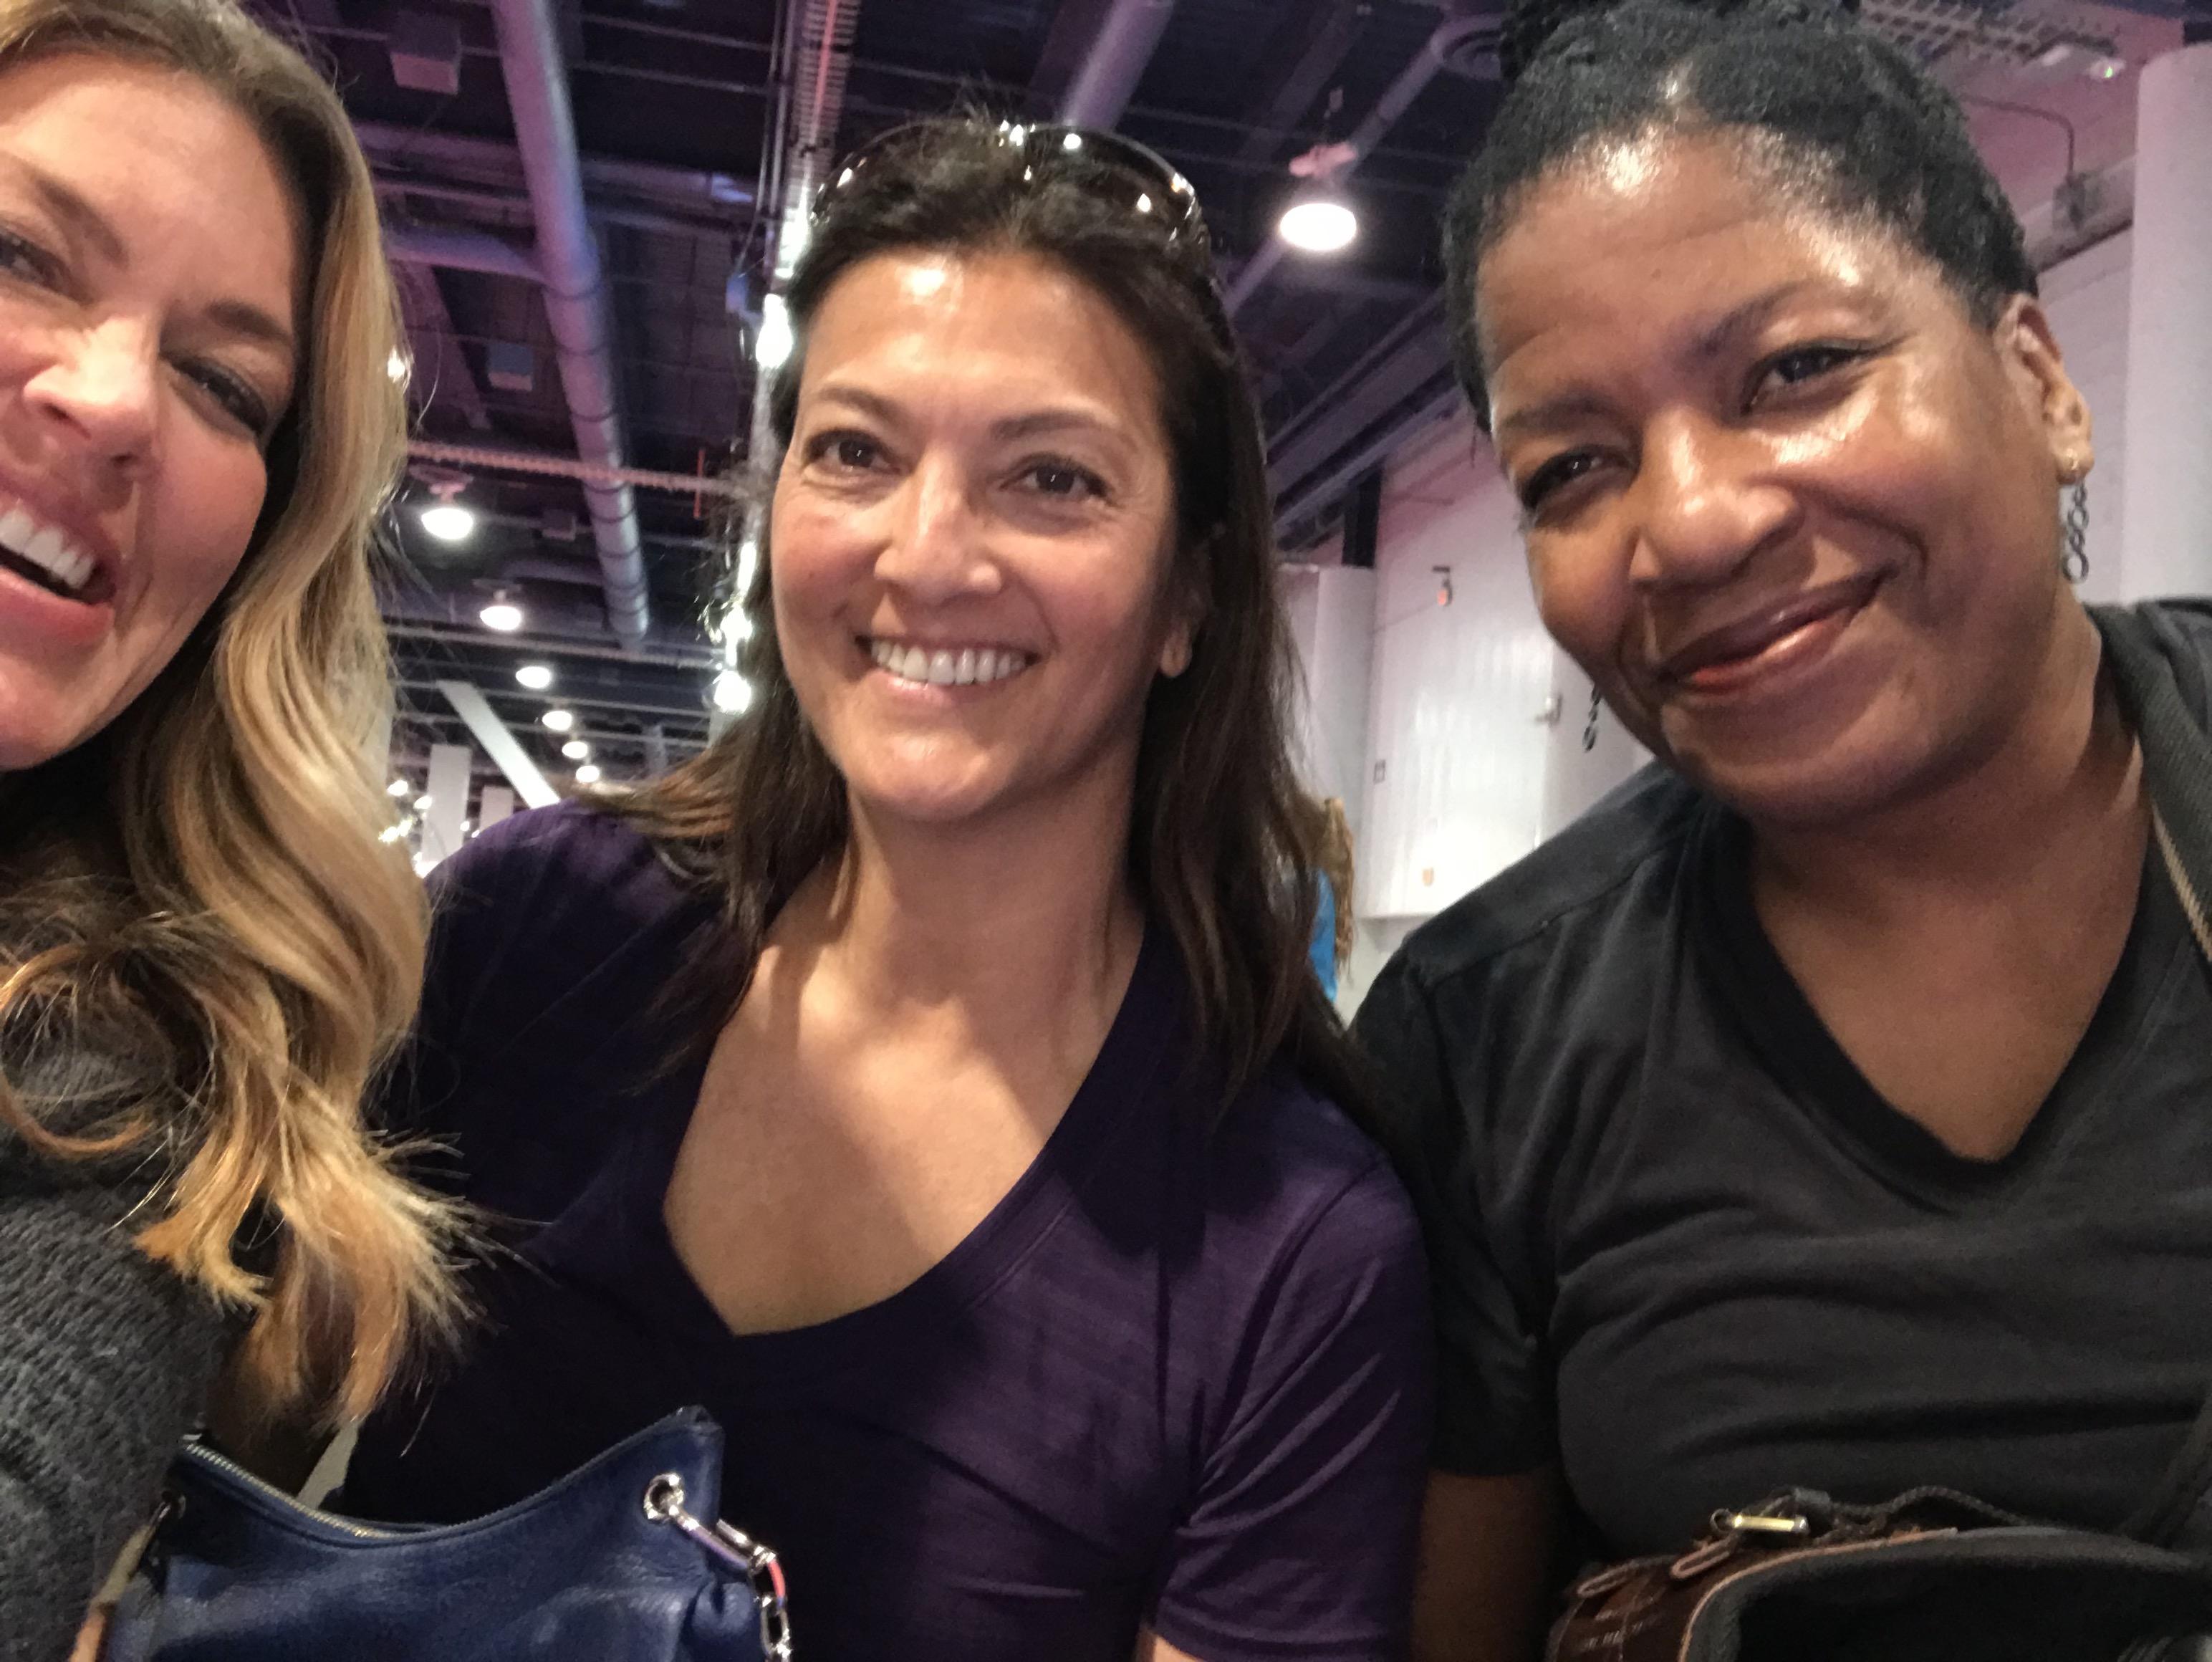 Liz Masakayan and April Chapple at the Las Vegas Convention Center